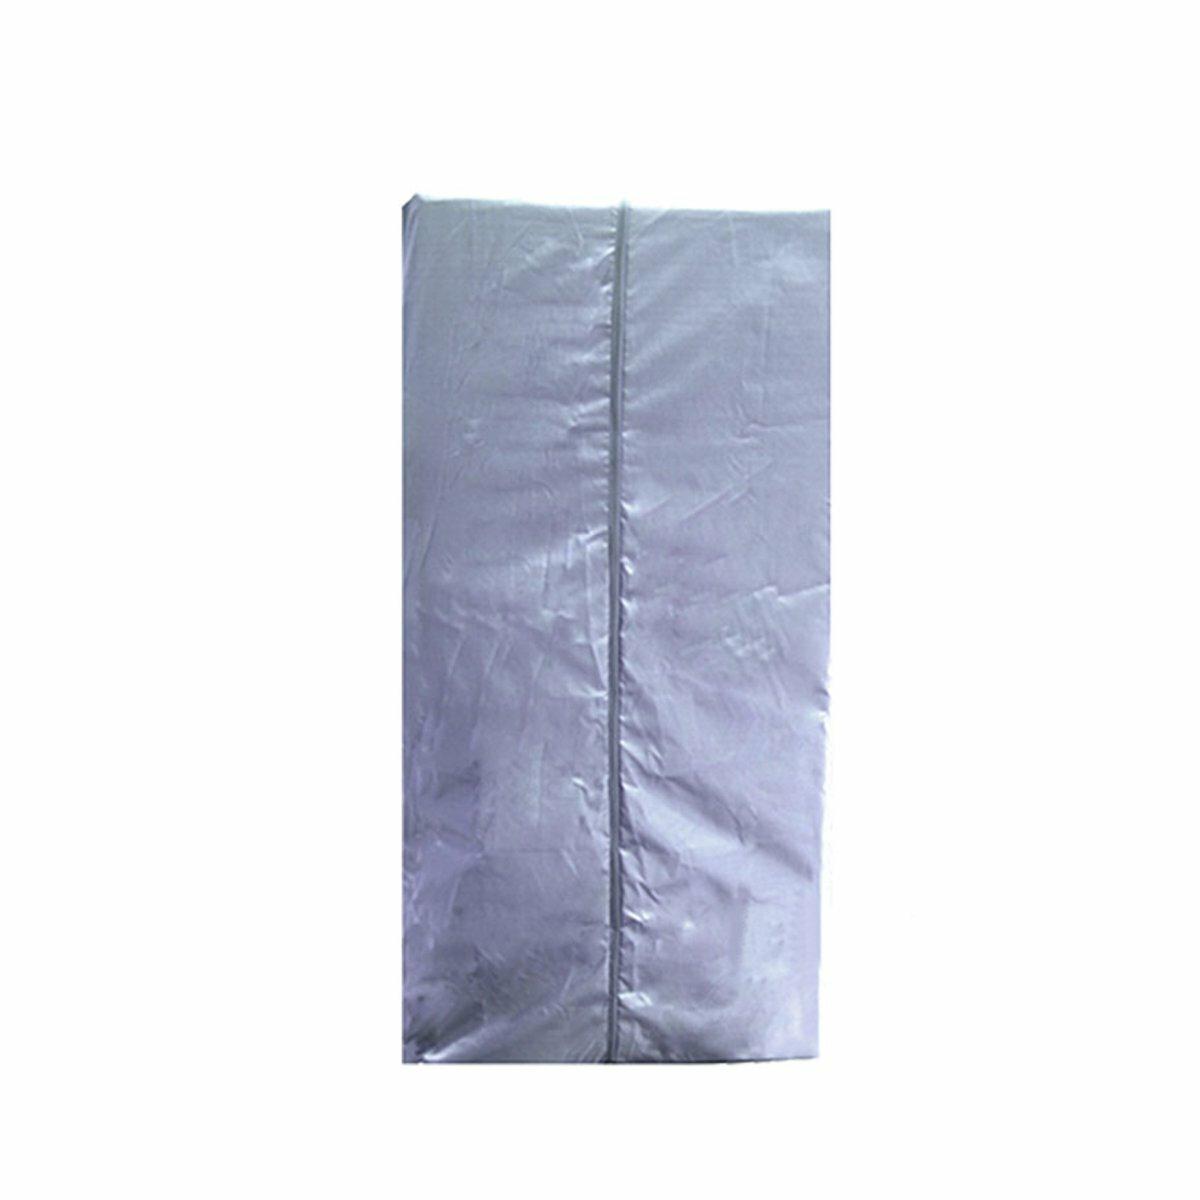 80x60x150cm Impermeable Cubierta de la cinta